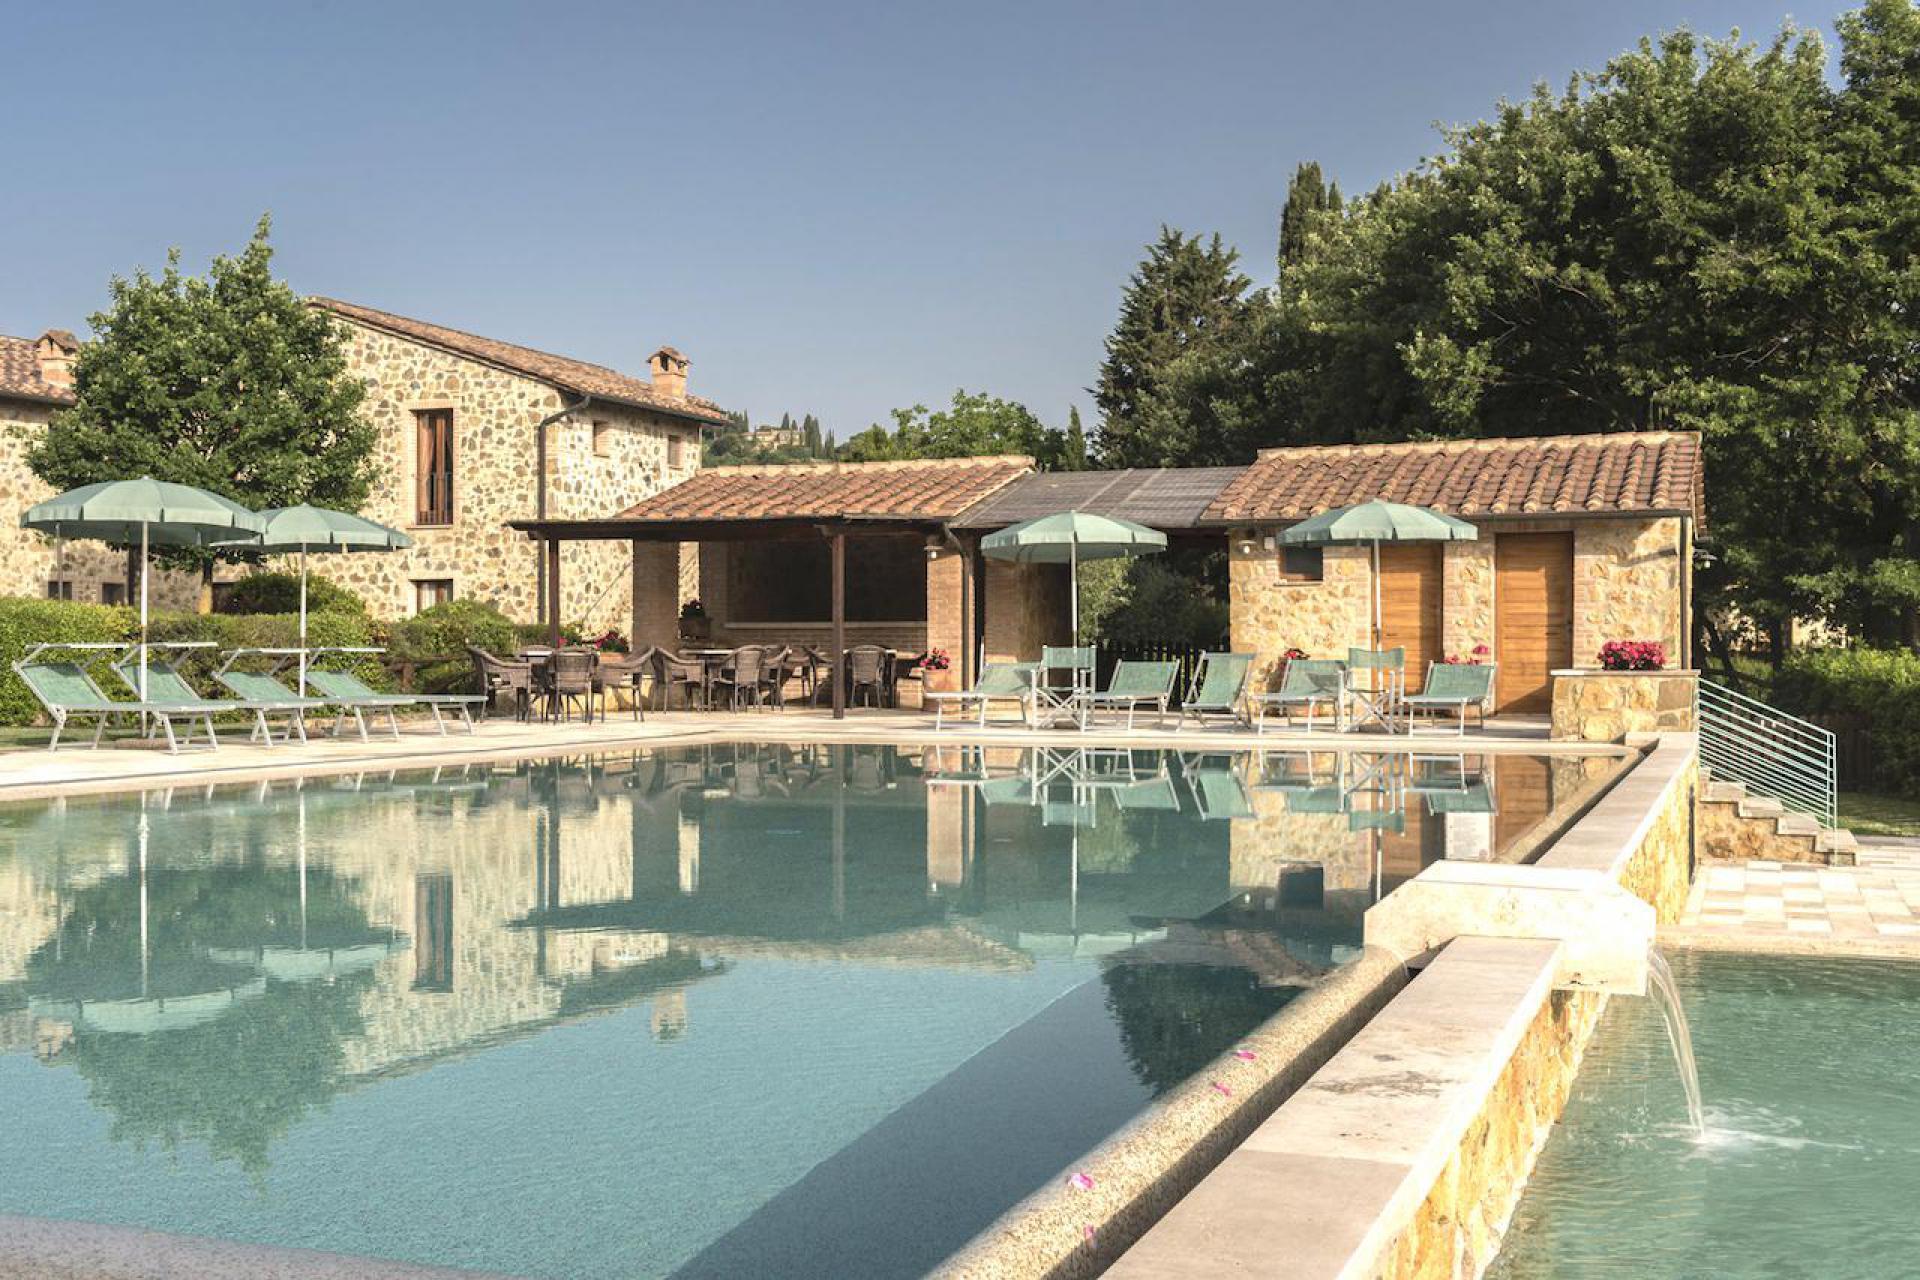 Agriturismo Toscana Resort di campagna in Toscana con bellissima piscina